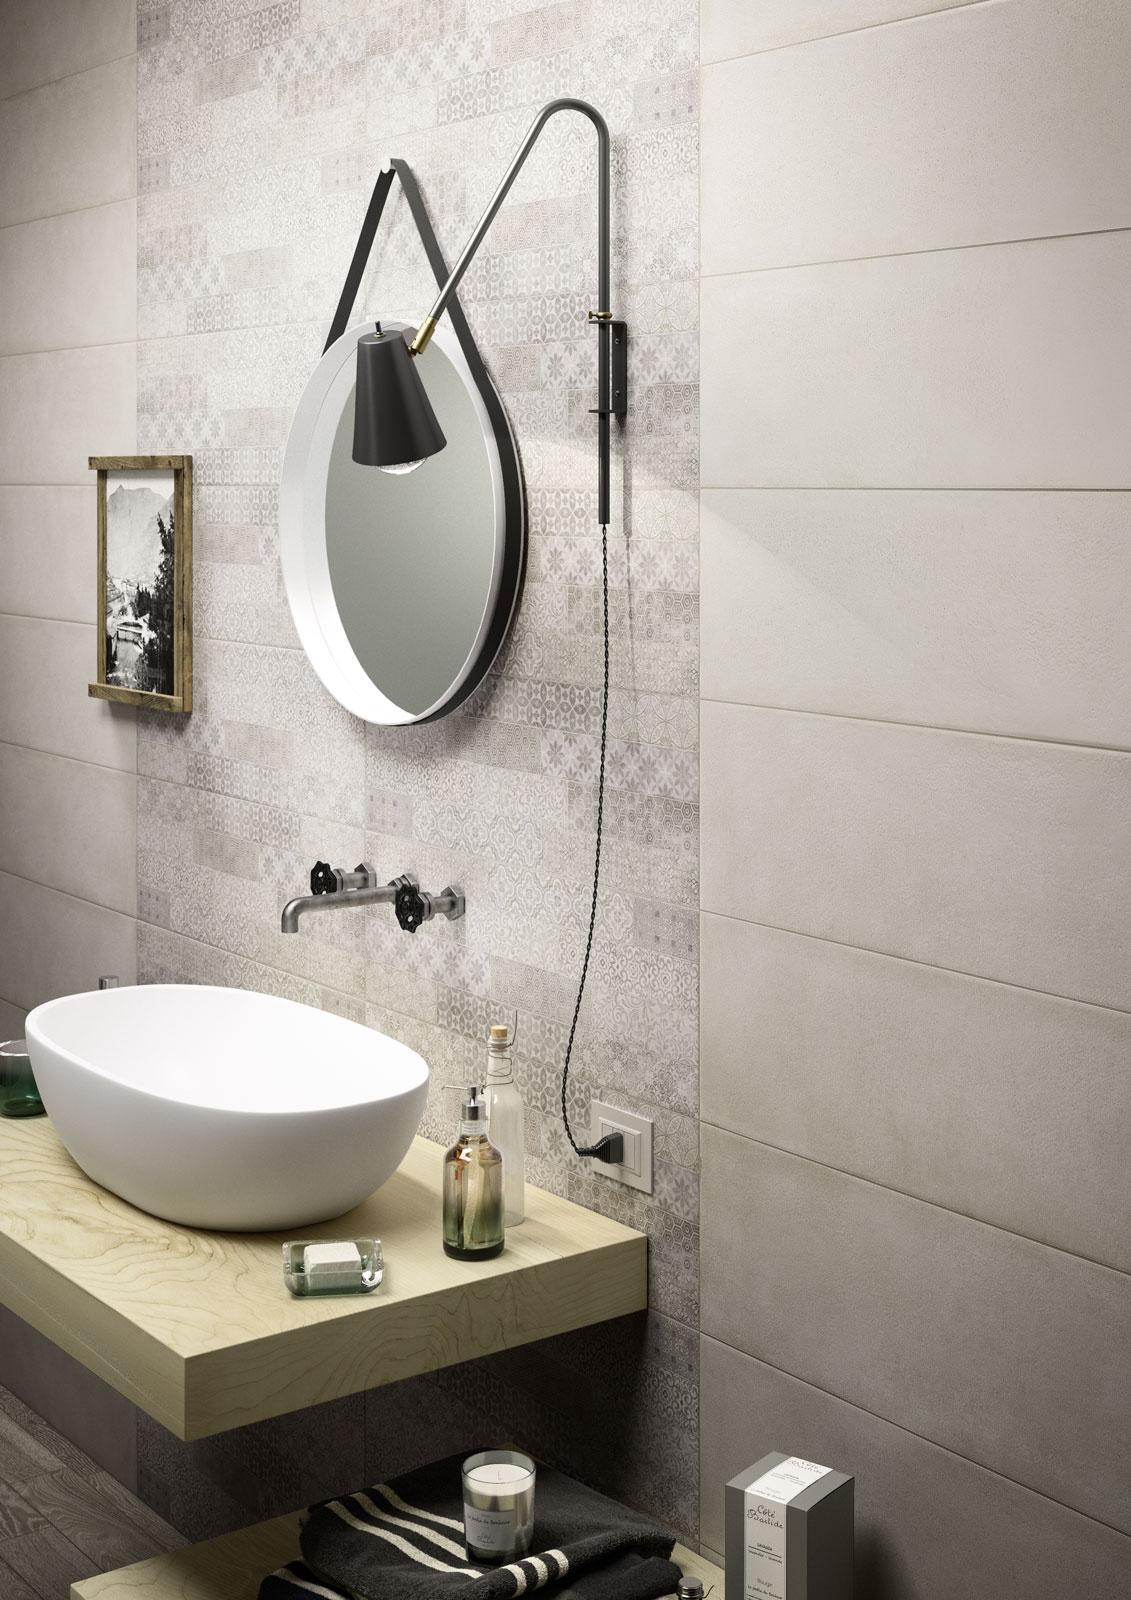 Clayline terracotta look ceramic wall covering marazzi for Gres porcellanato carrelage